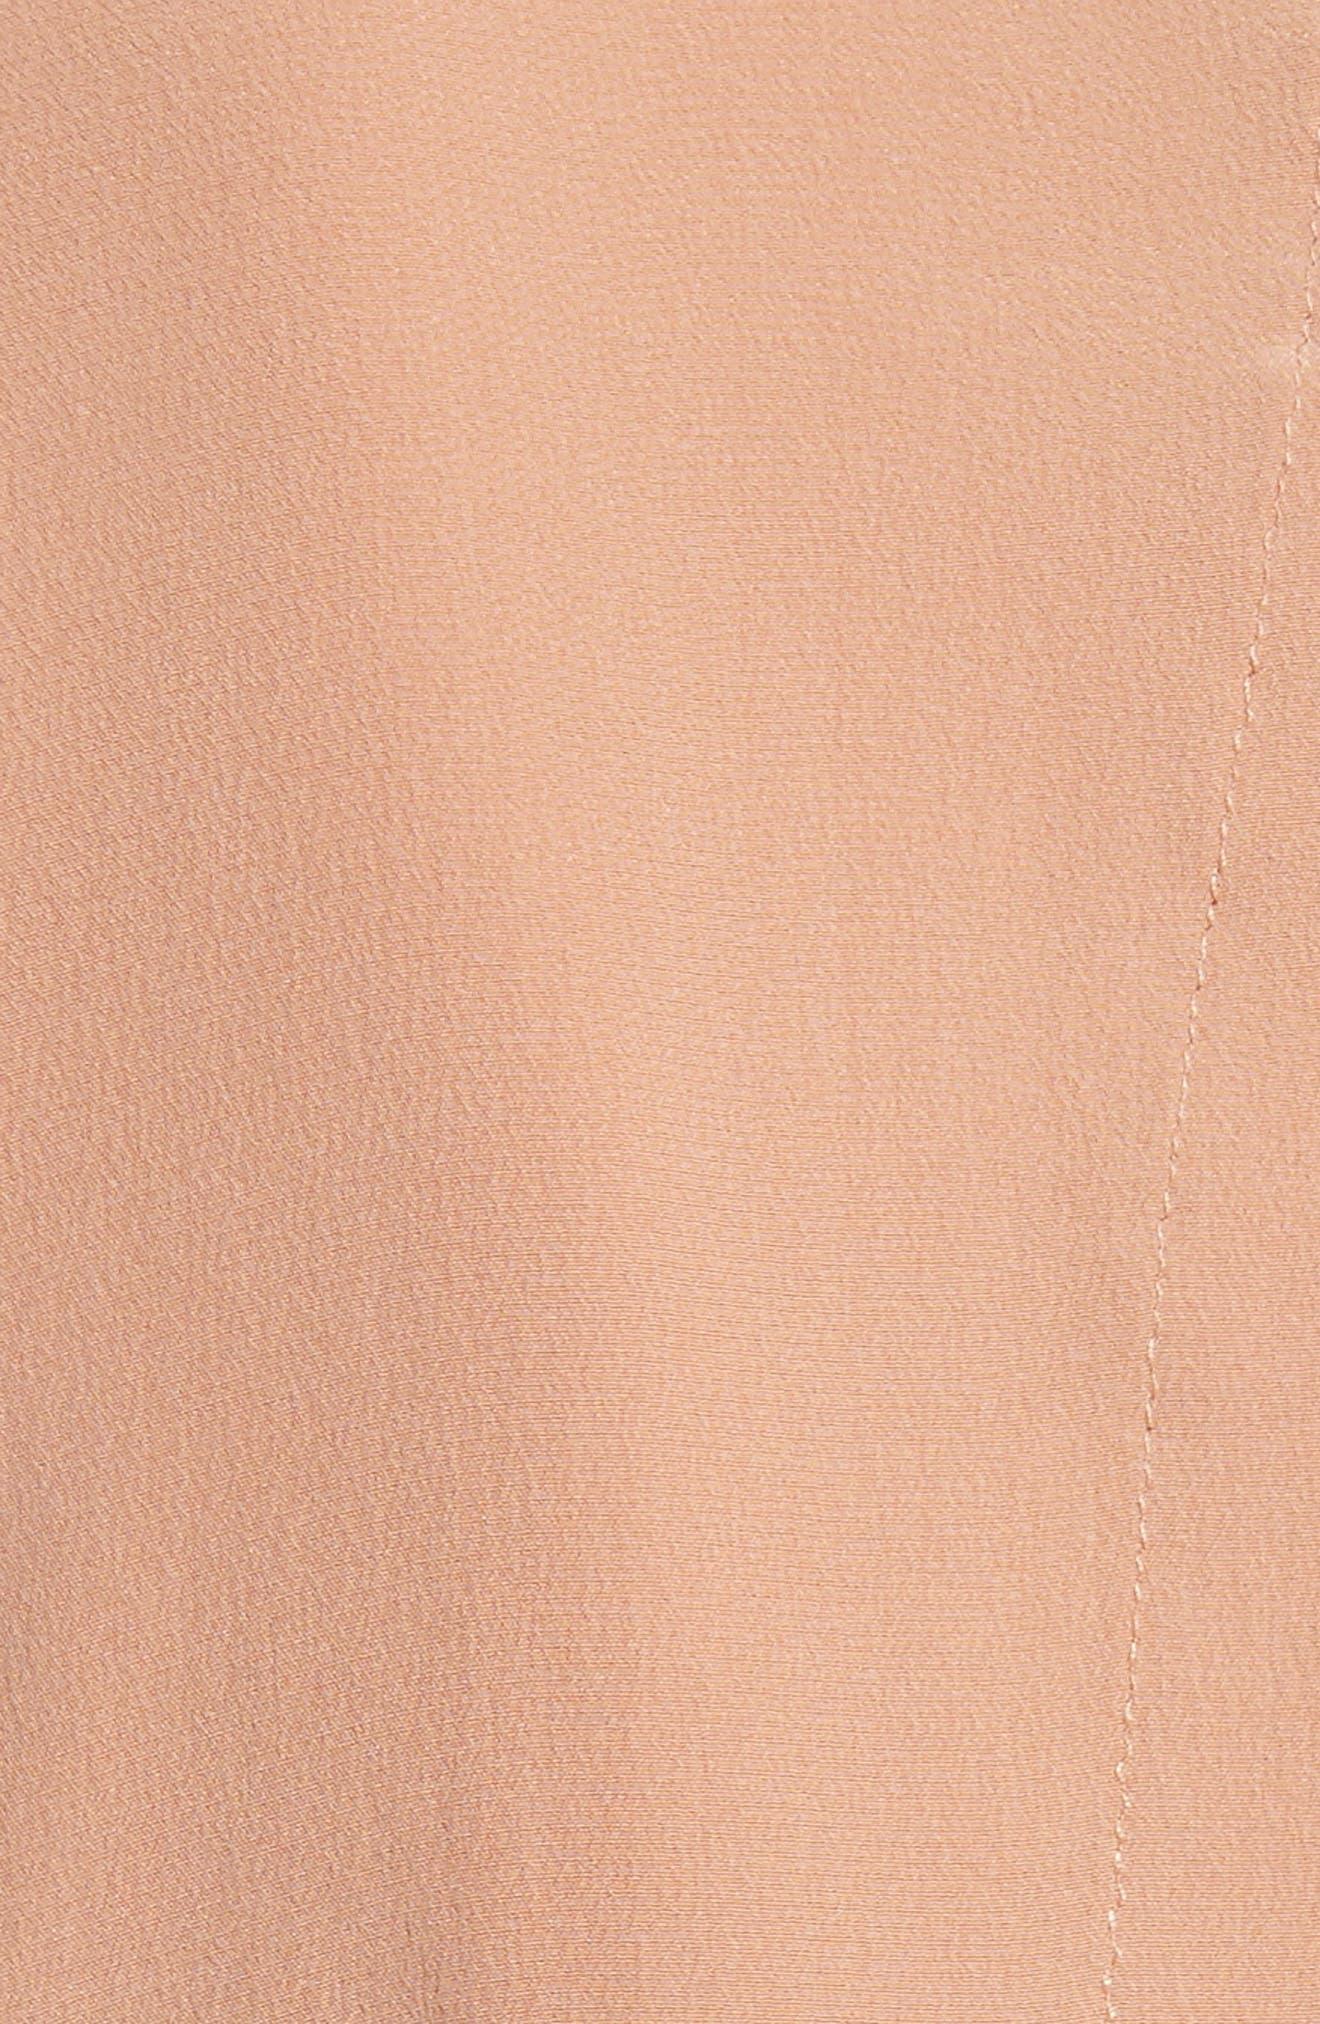 Silk Slit Back Shirtdress,                             Alternate thumbnail 10, color,